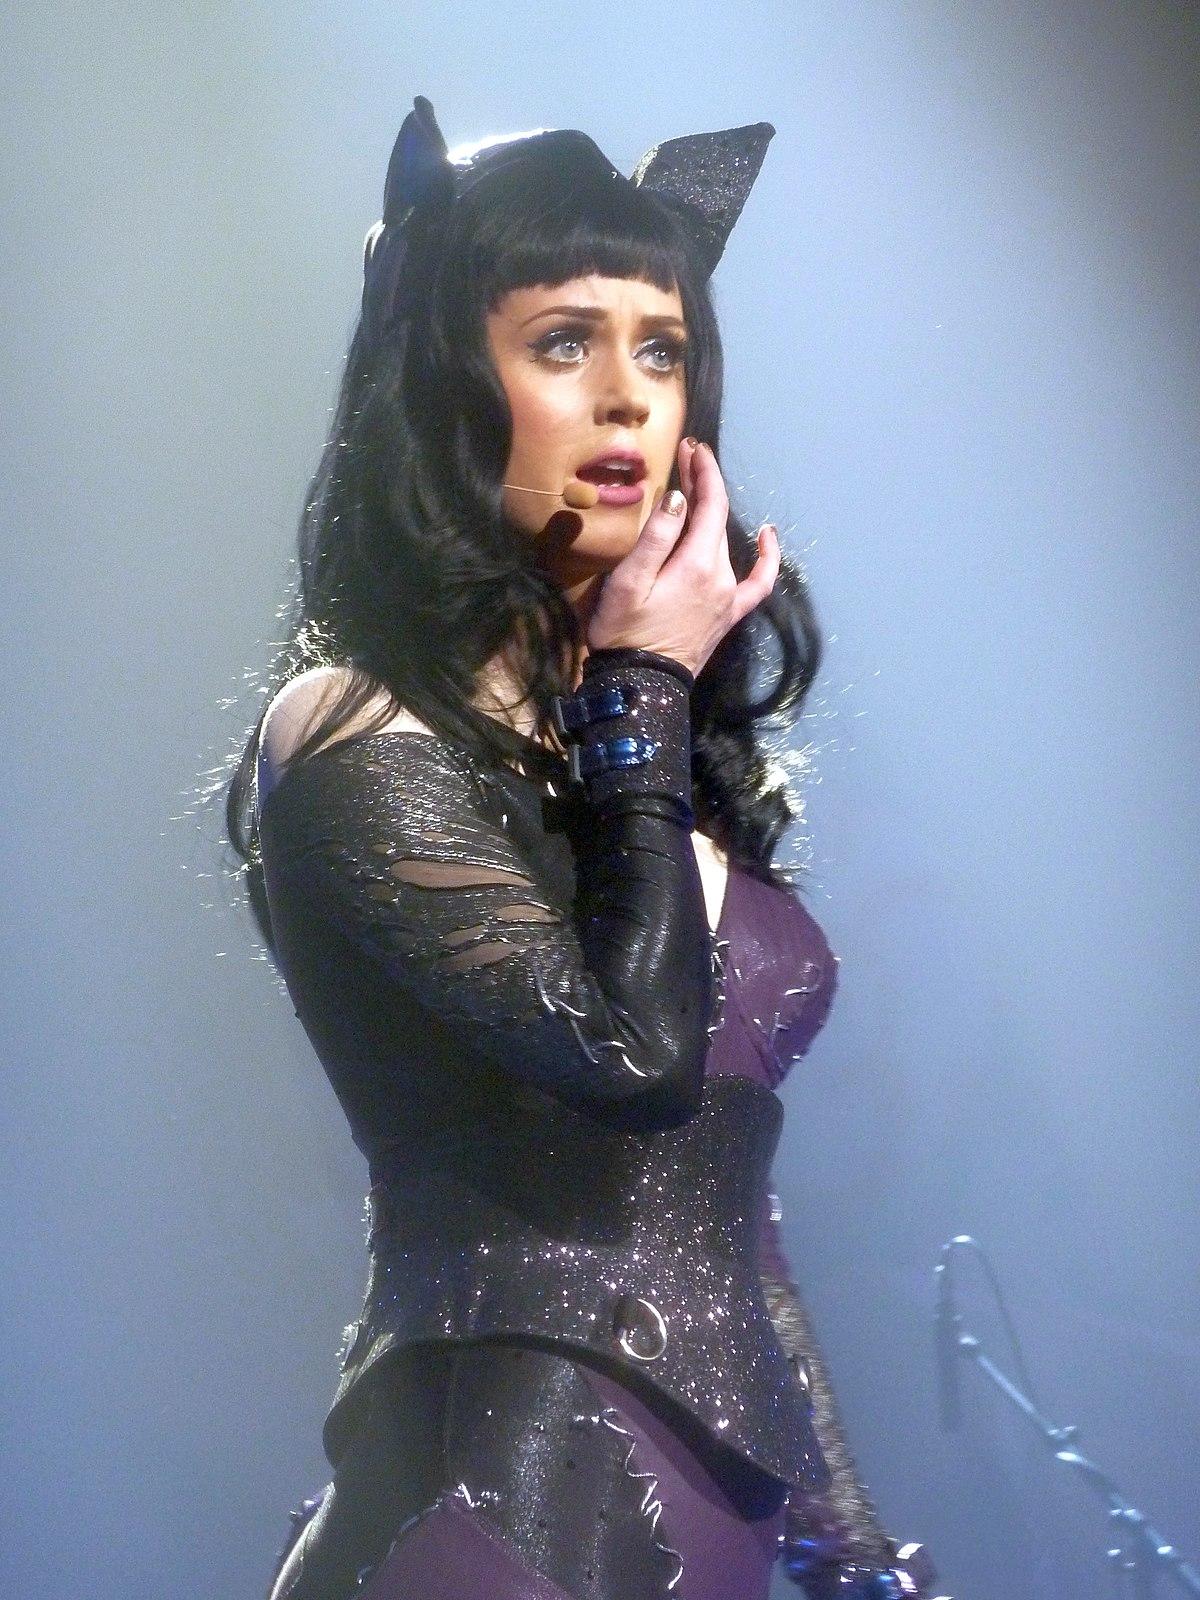 Katy Perry - Wikipedia bahasa Indonesia, ensiklopedia bebas